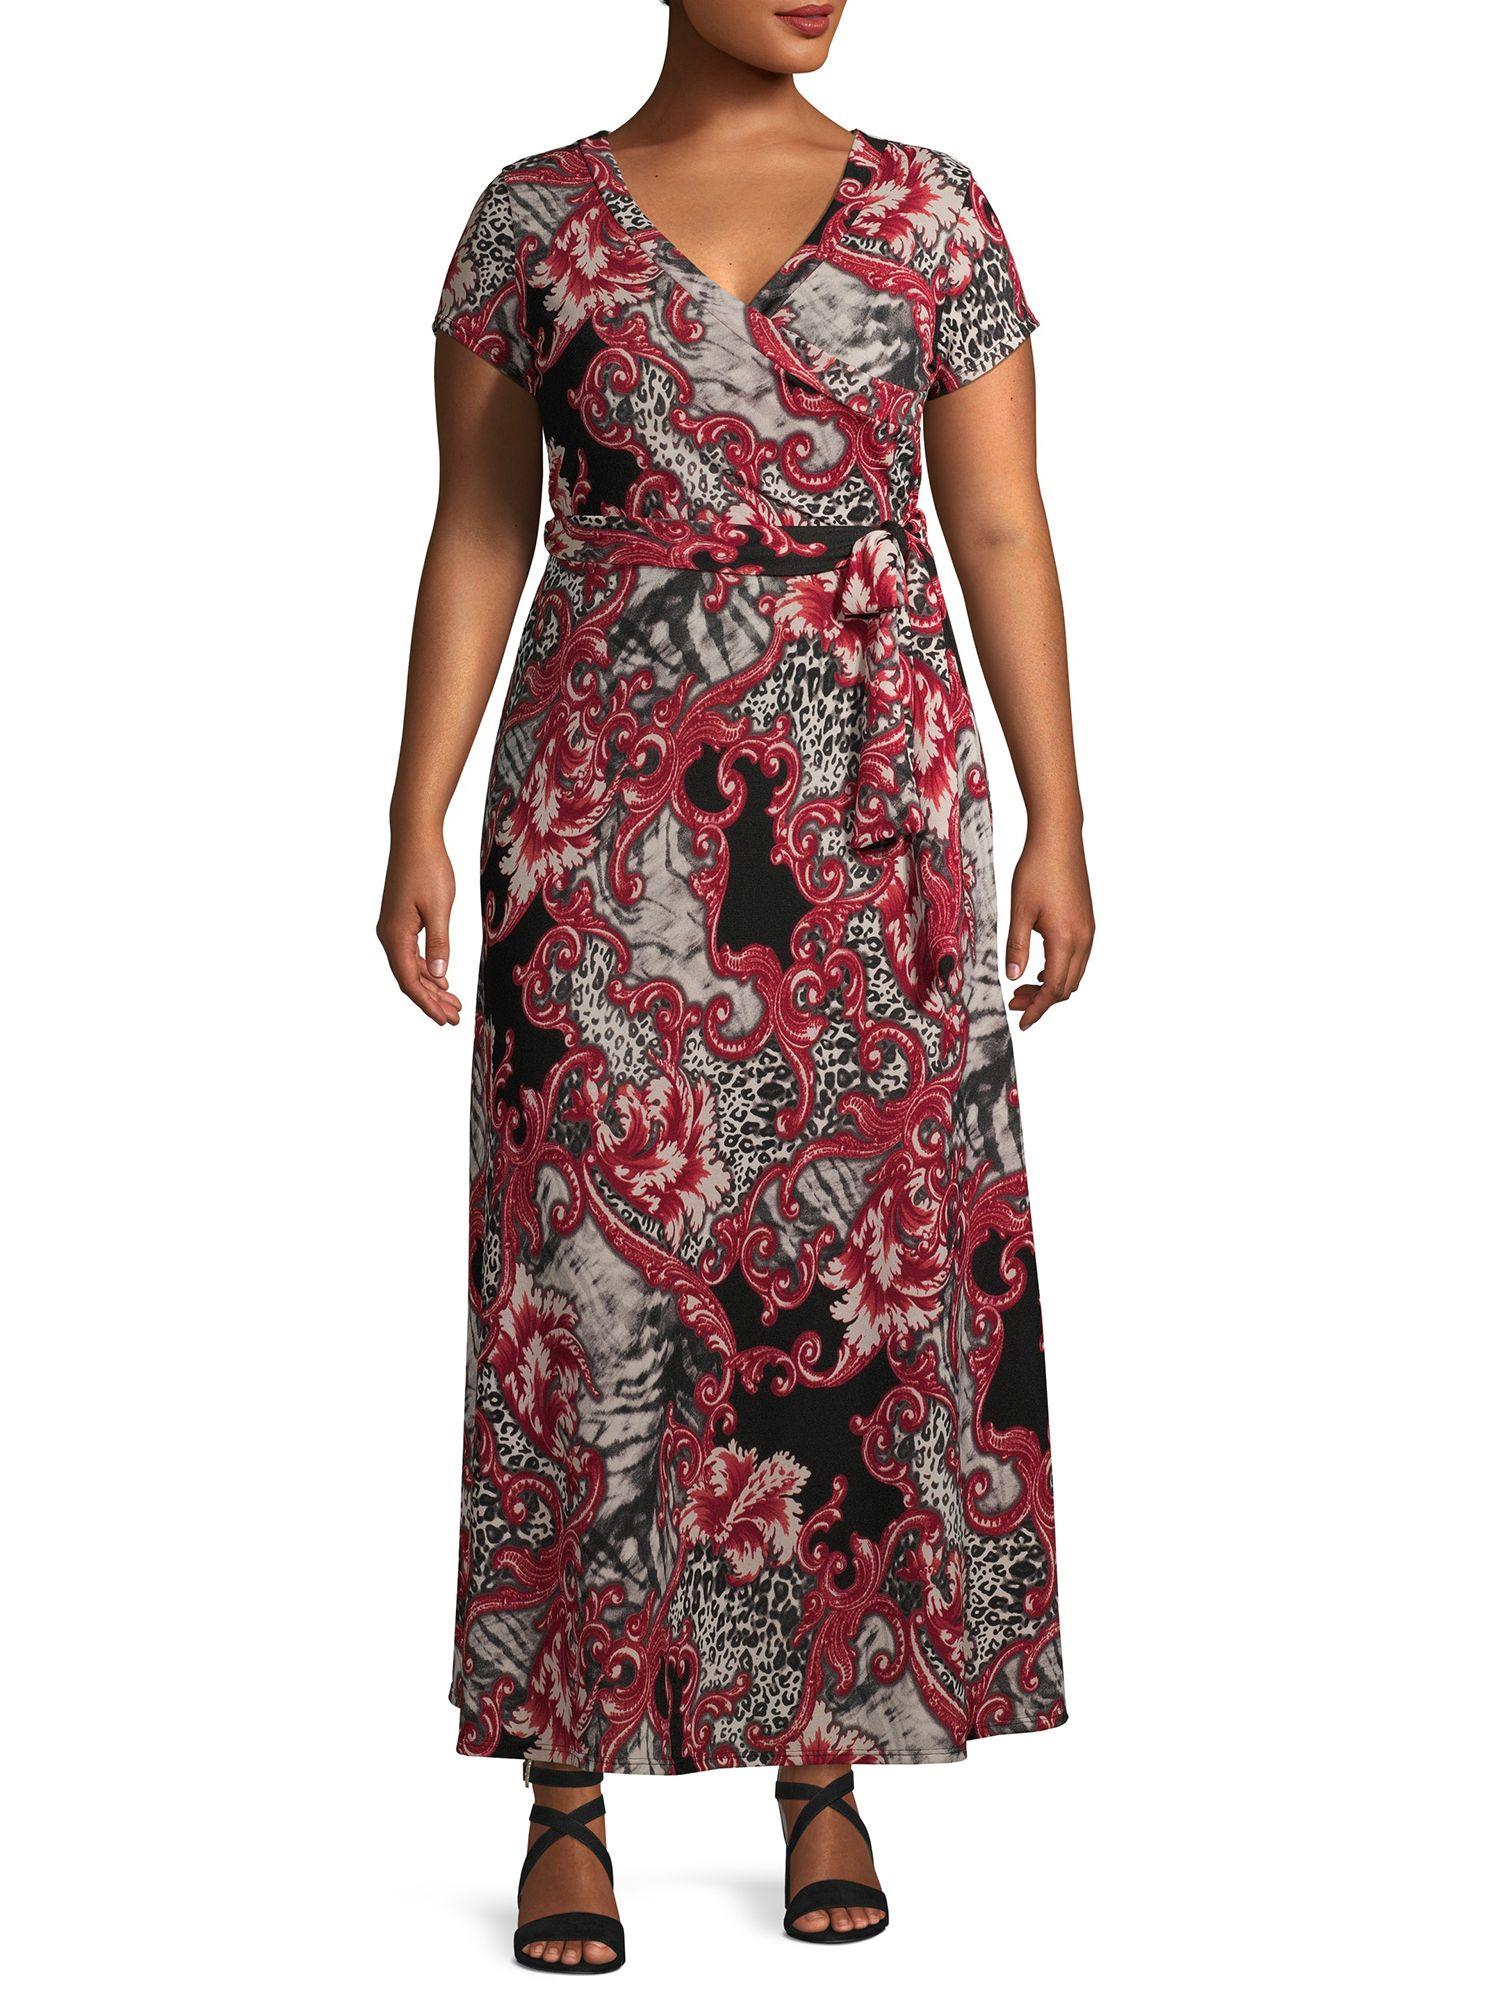 Ella Samani Ella Samani Plus Size Short Sleeve Maxi Wrap Dress Walmart Com Maxi Wrap Dress Dresses Wrap Dress [ 2000 x 1500 Pixel ]